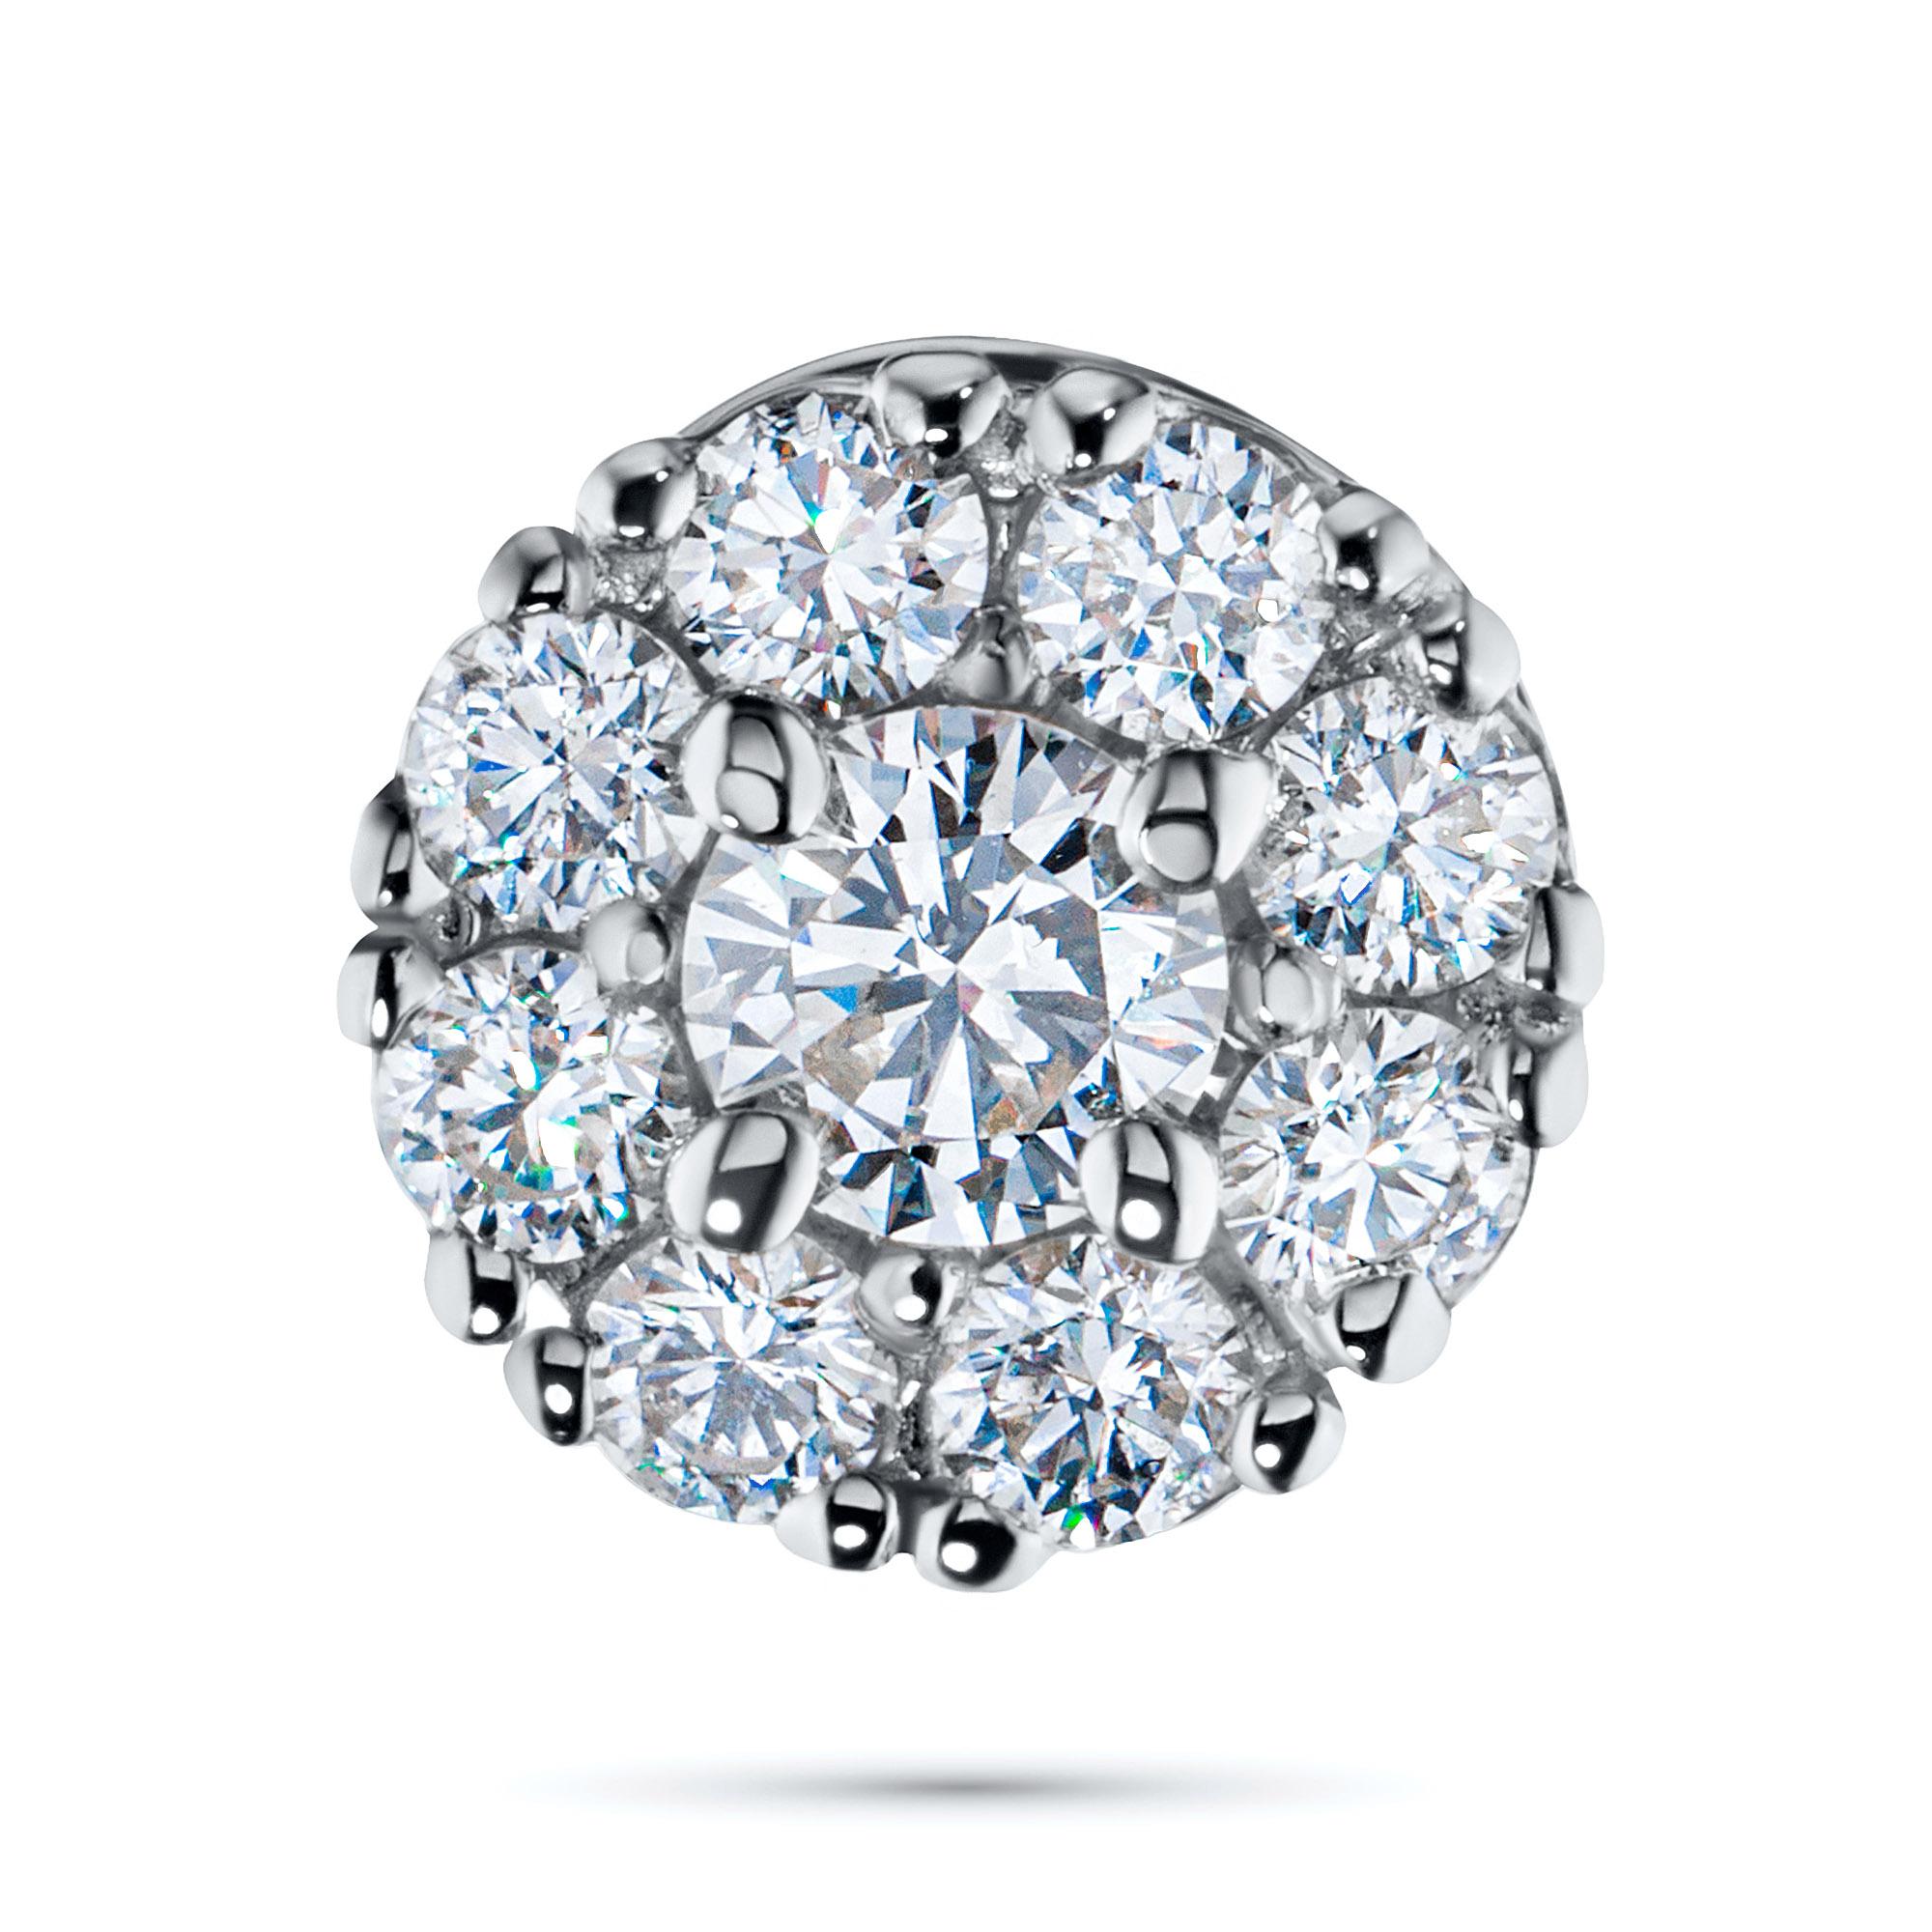 Подвеска из белого золота с бриллиантами э0901пд10163800 э0901пд10163800